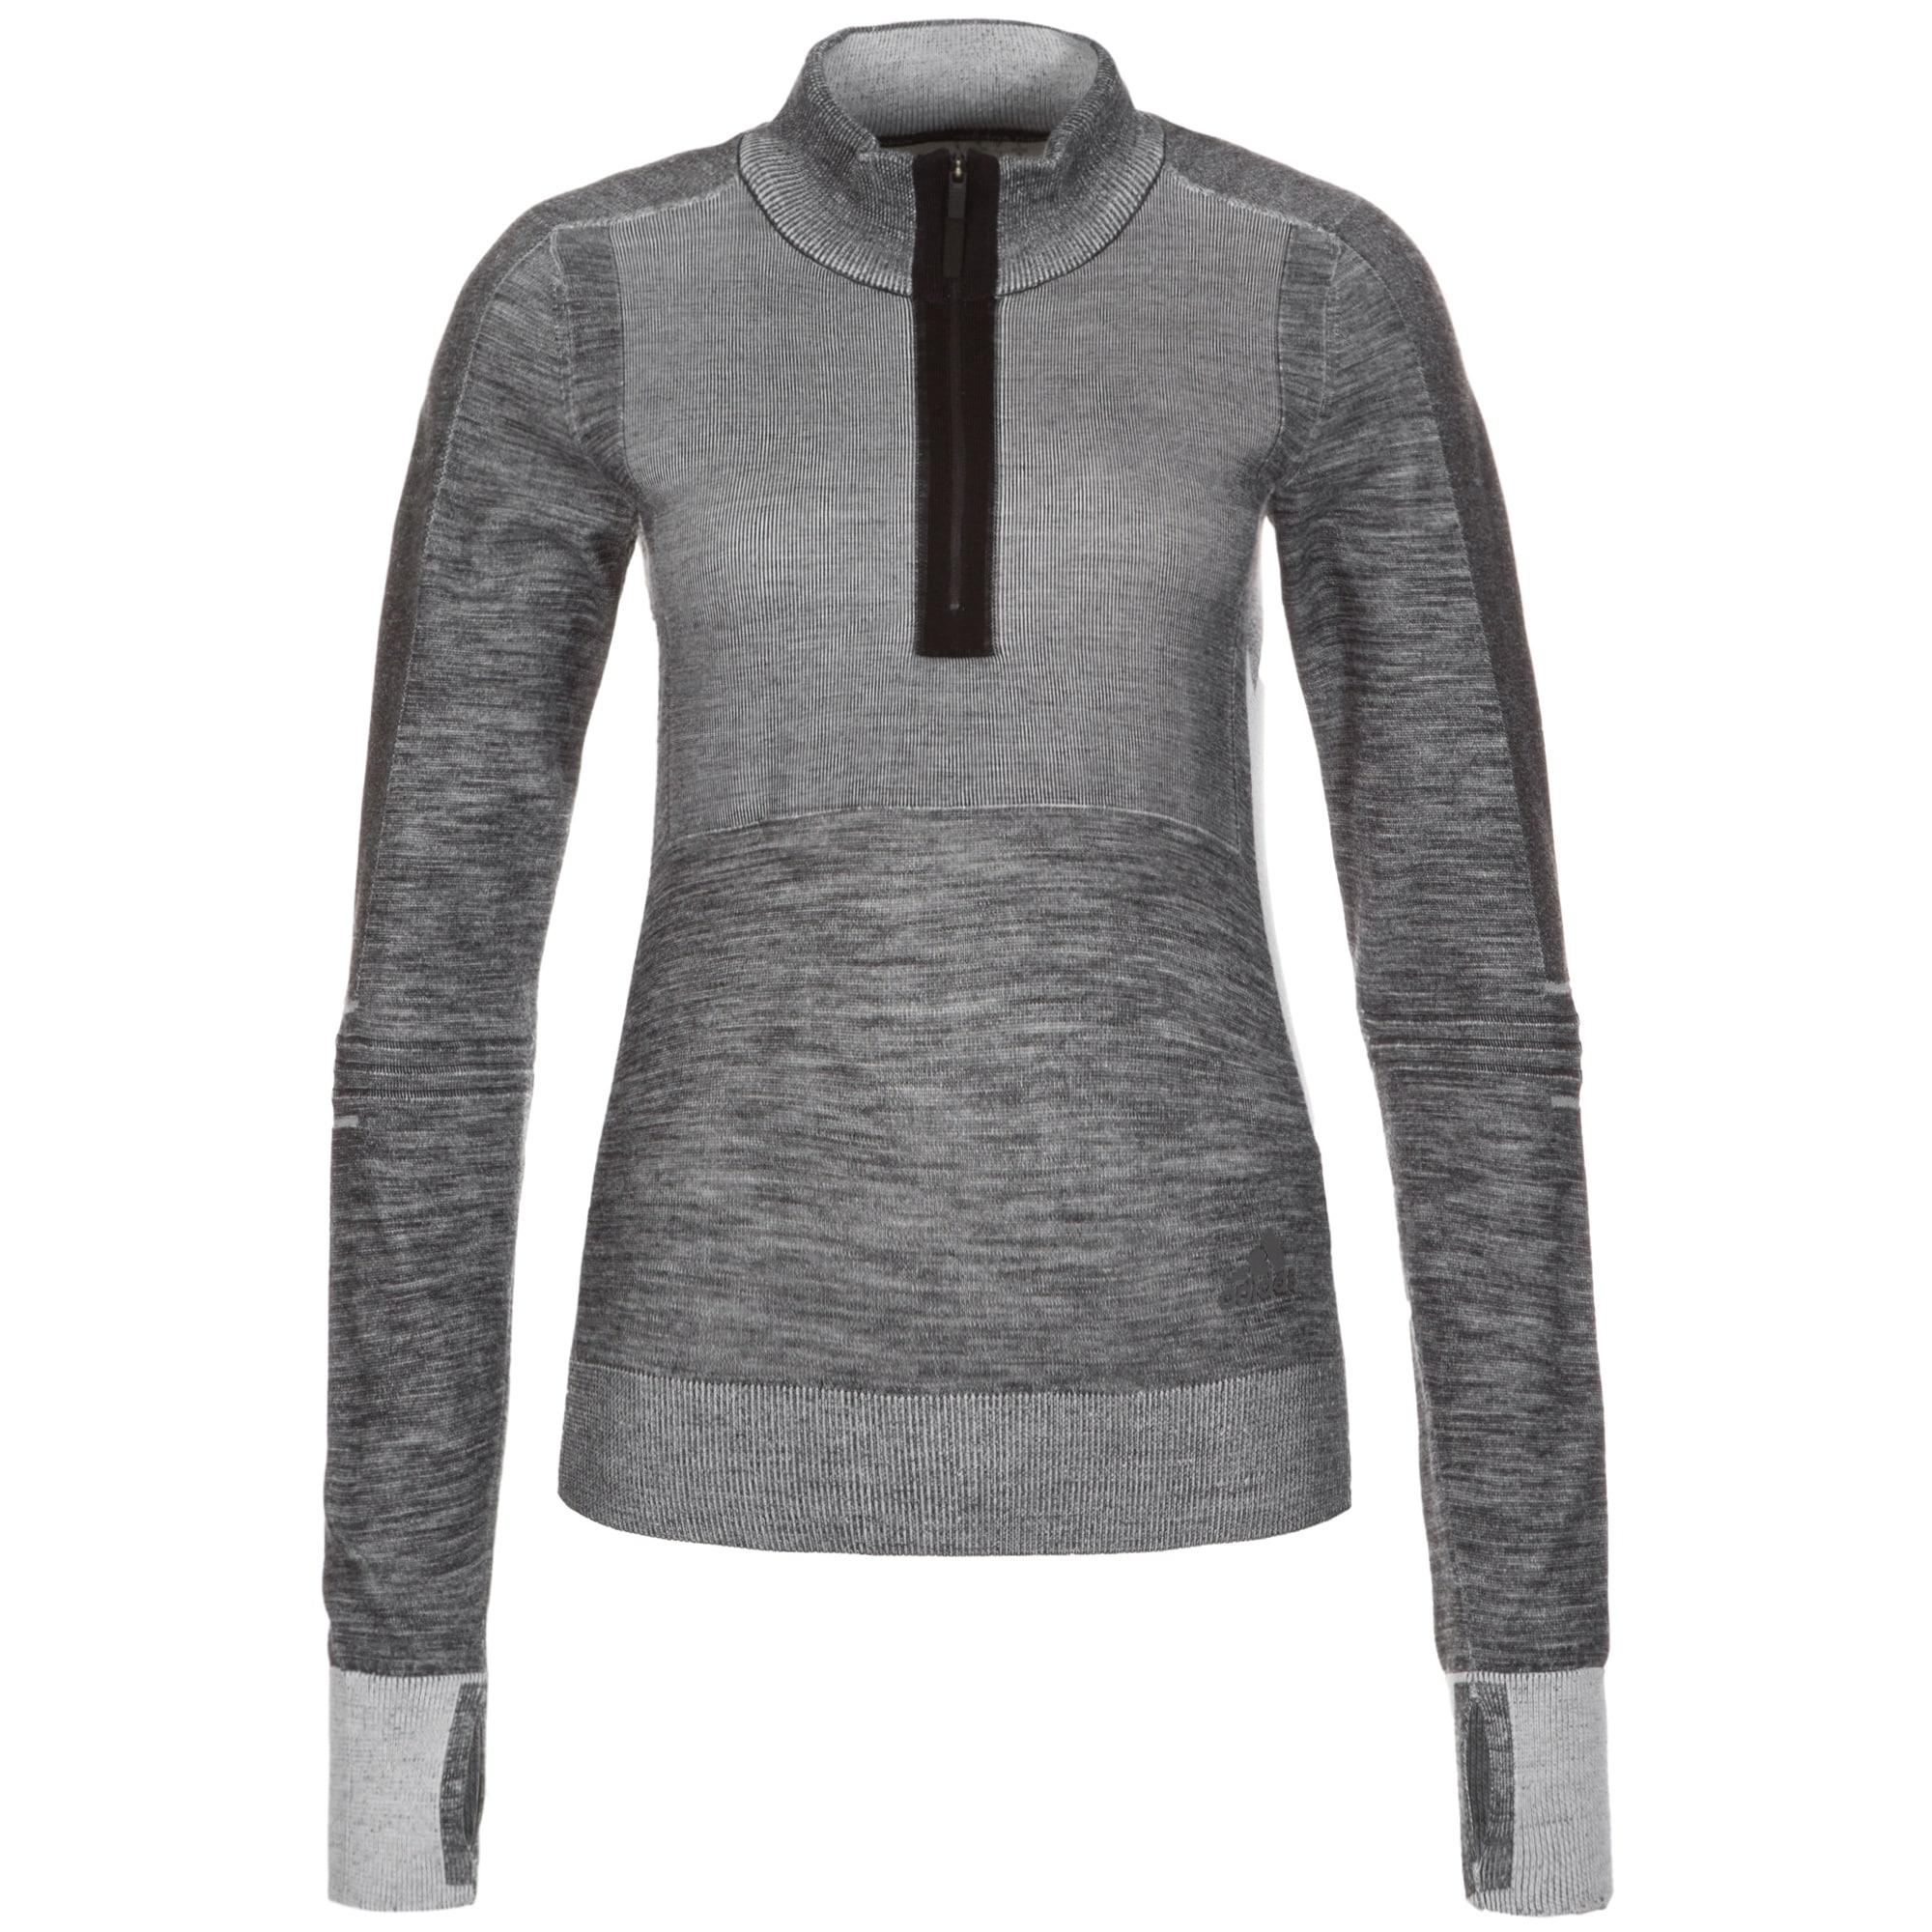 Laufshirt 'Priknit' | Sportbekleidung > Sportshirts > Laufshirts | ADIDAS PERFORMANCE